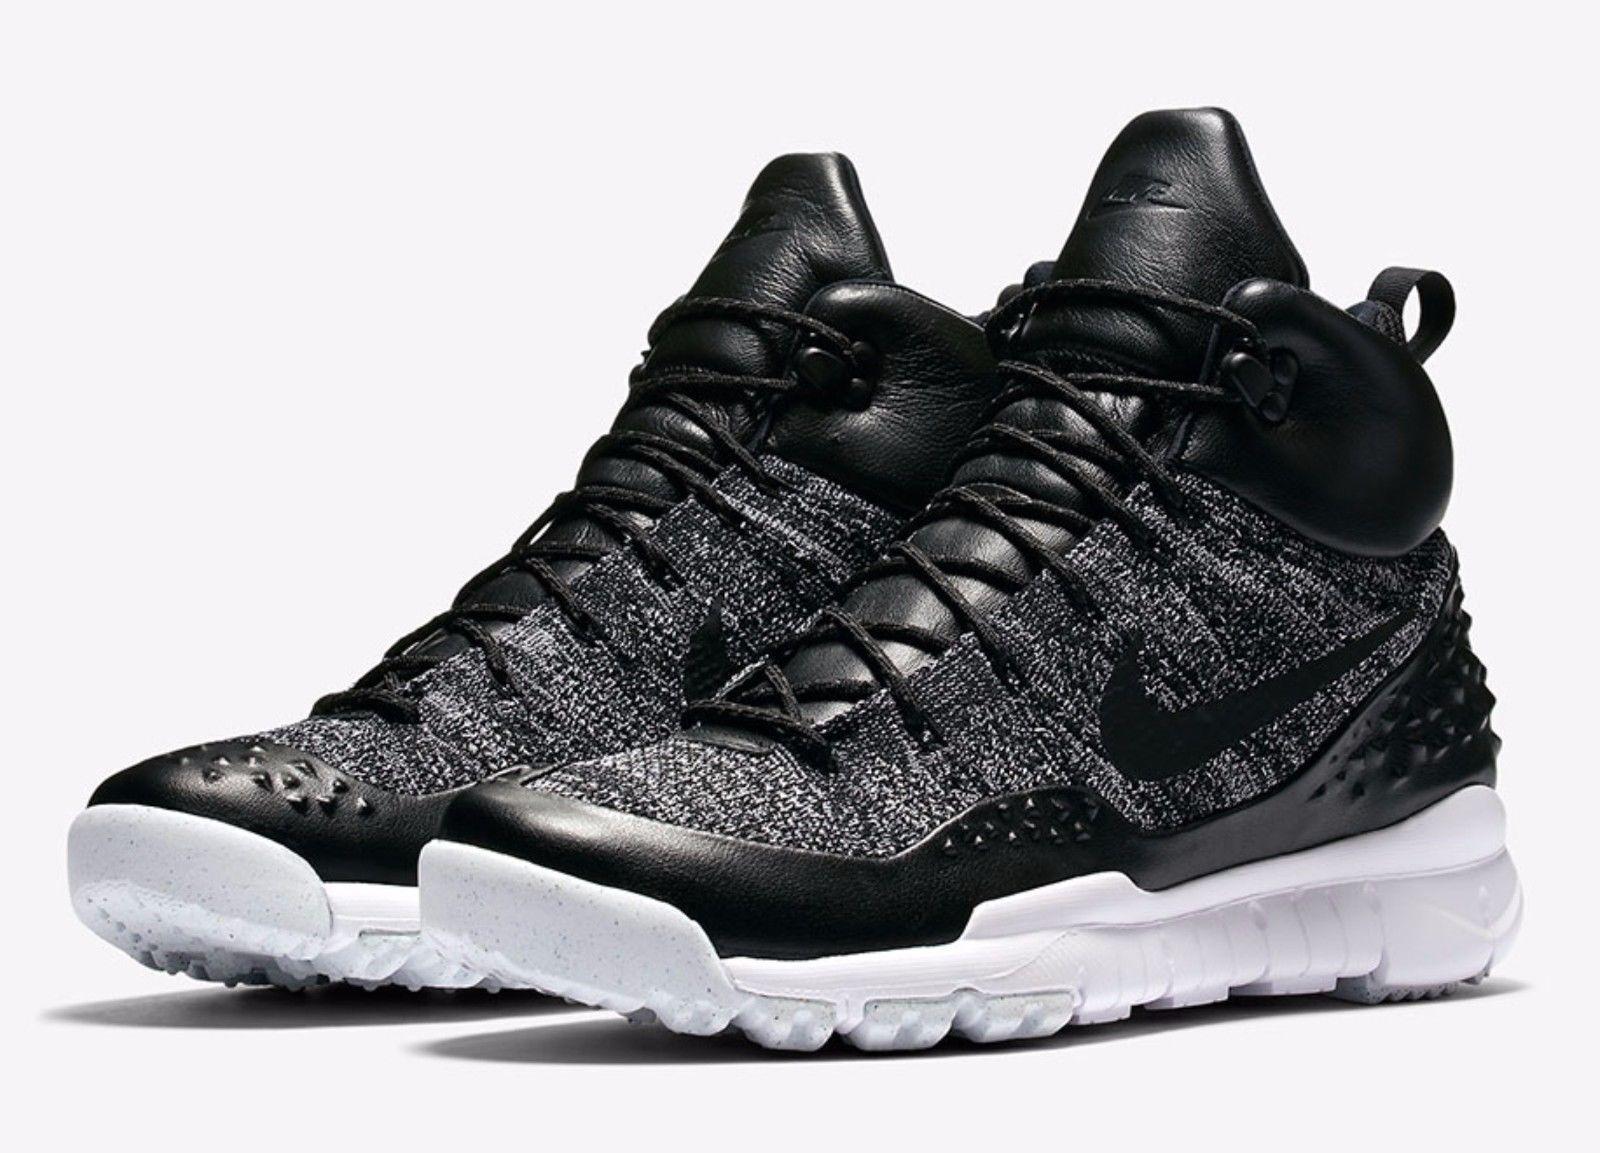 New Sz 8.5 Men's Nike Lupinek Flyknit NikeLab NSW Oreo Black White 862505-001 B